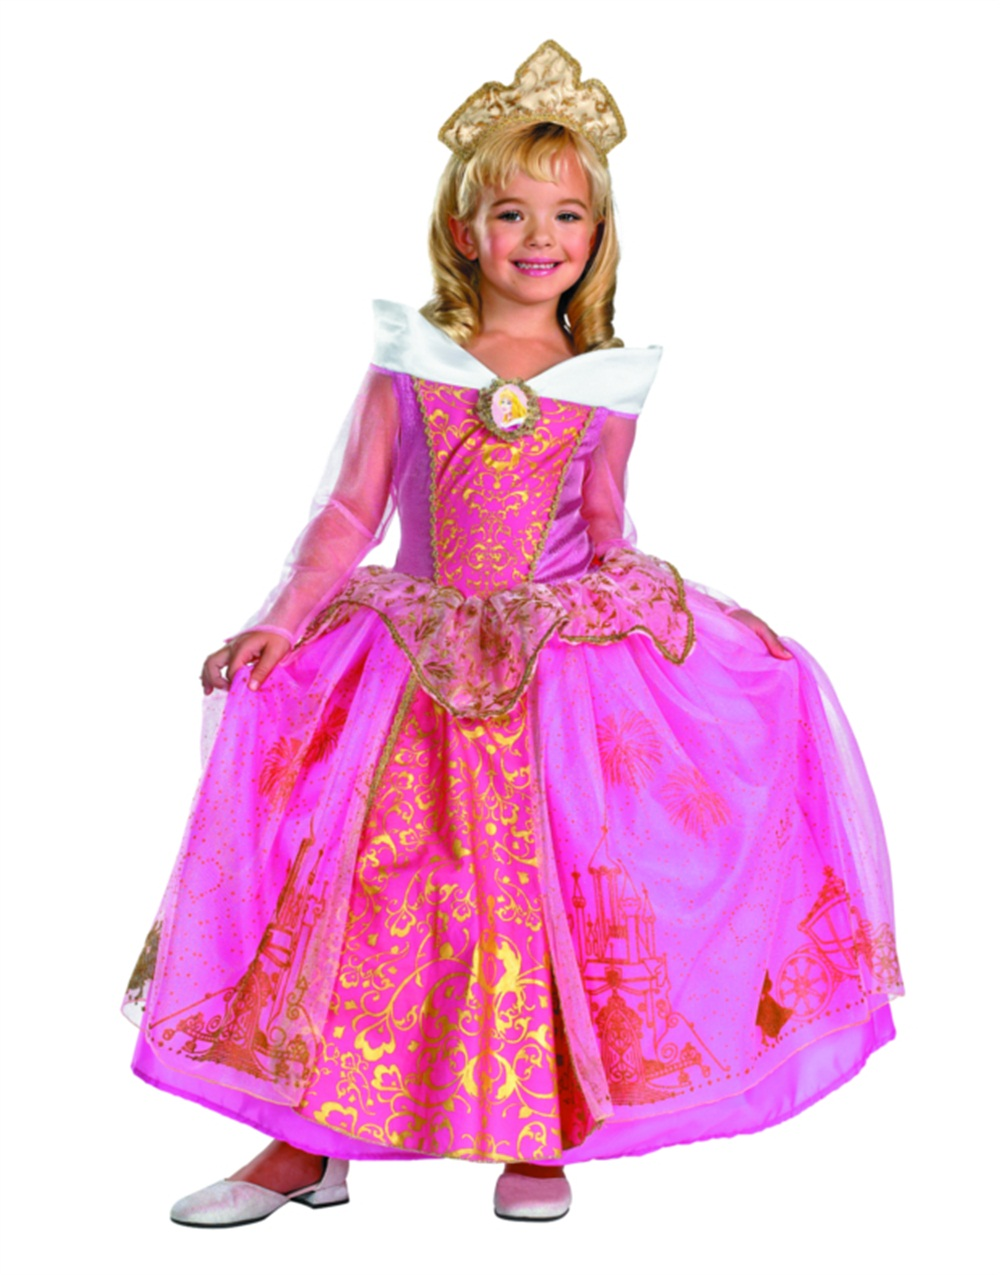 Barbie Halloween Costume Kids.Aurora Prestige Toddler Halloween Costume Size Toddler Girls One Size